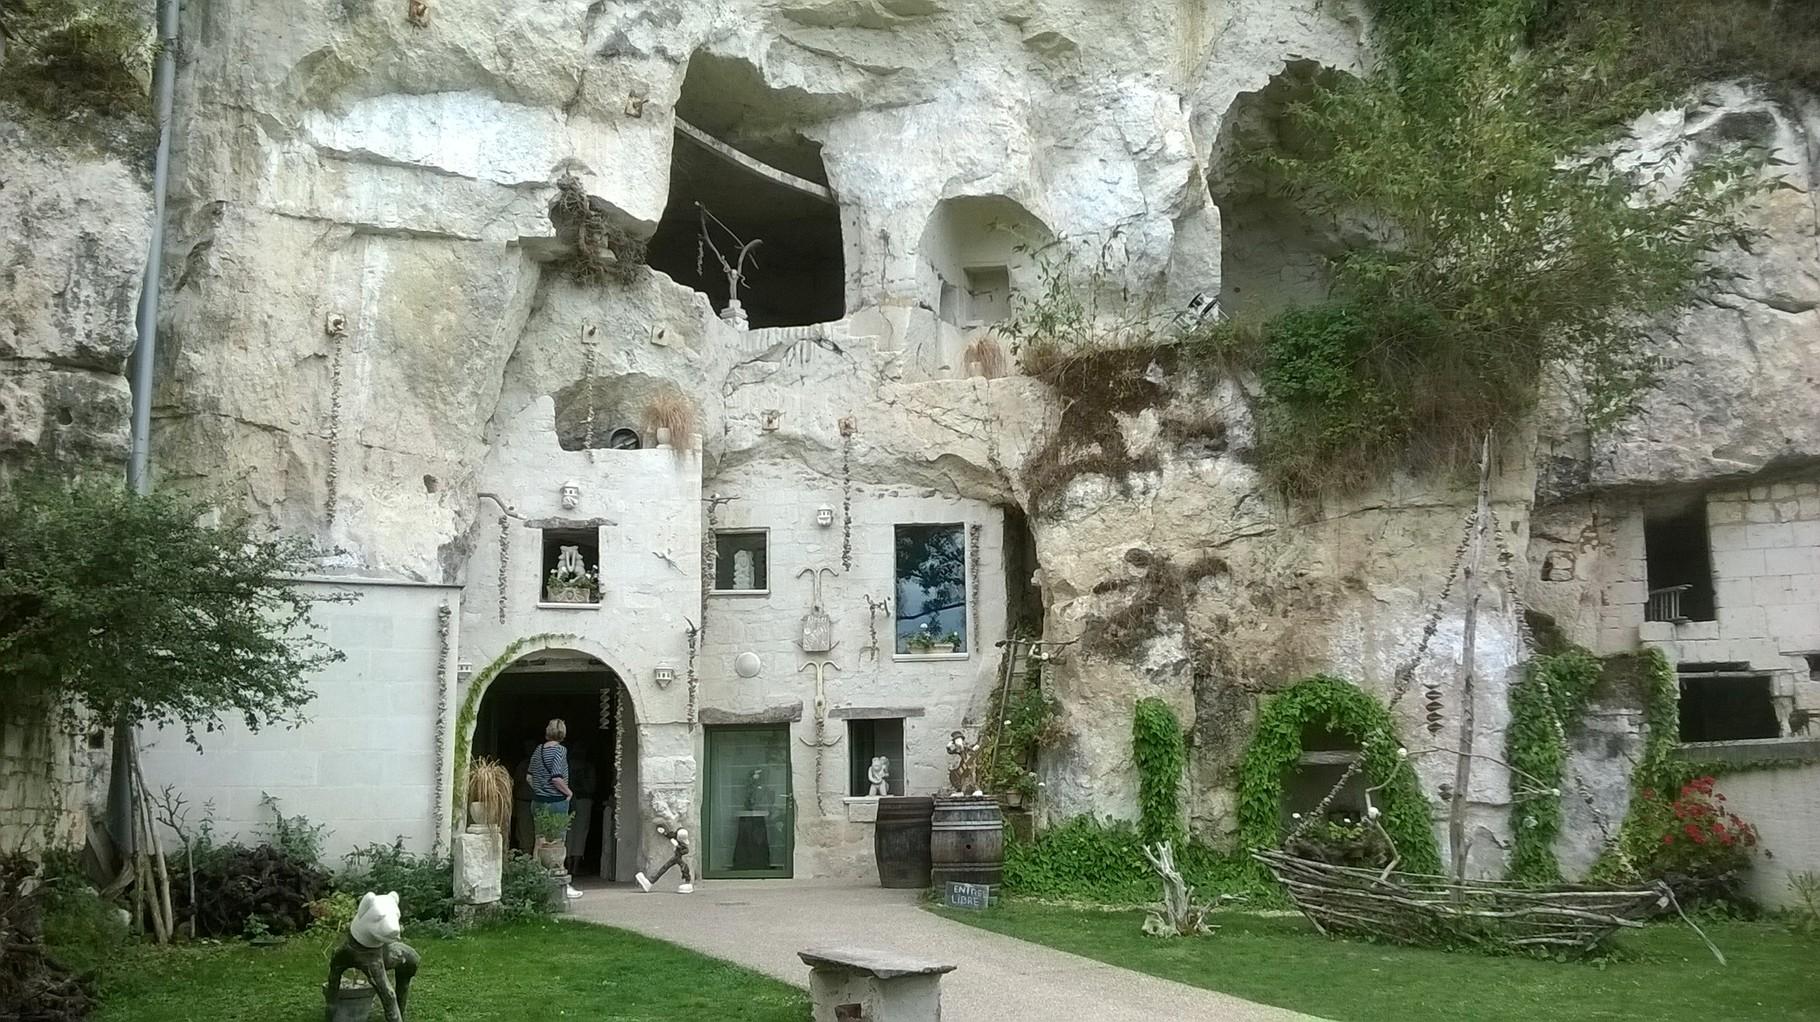 Maisons troglodytes à Turquant